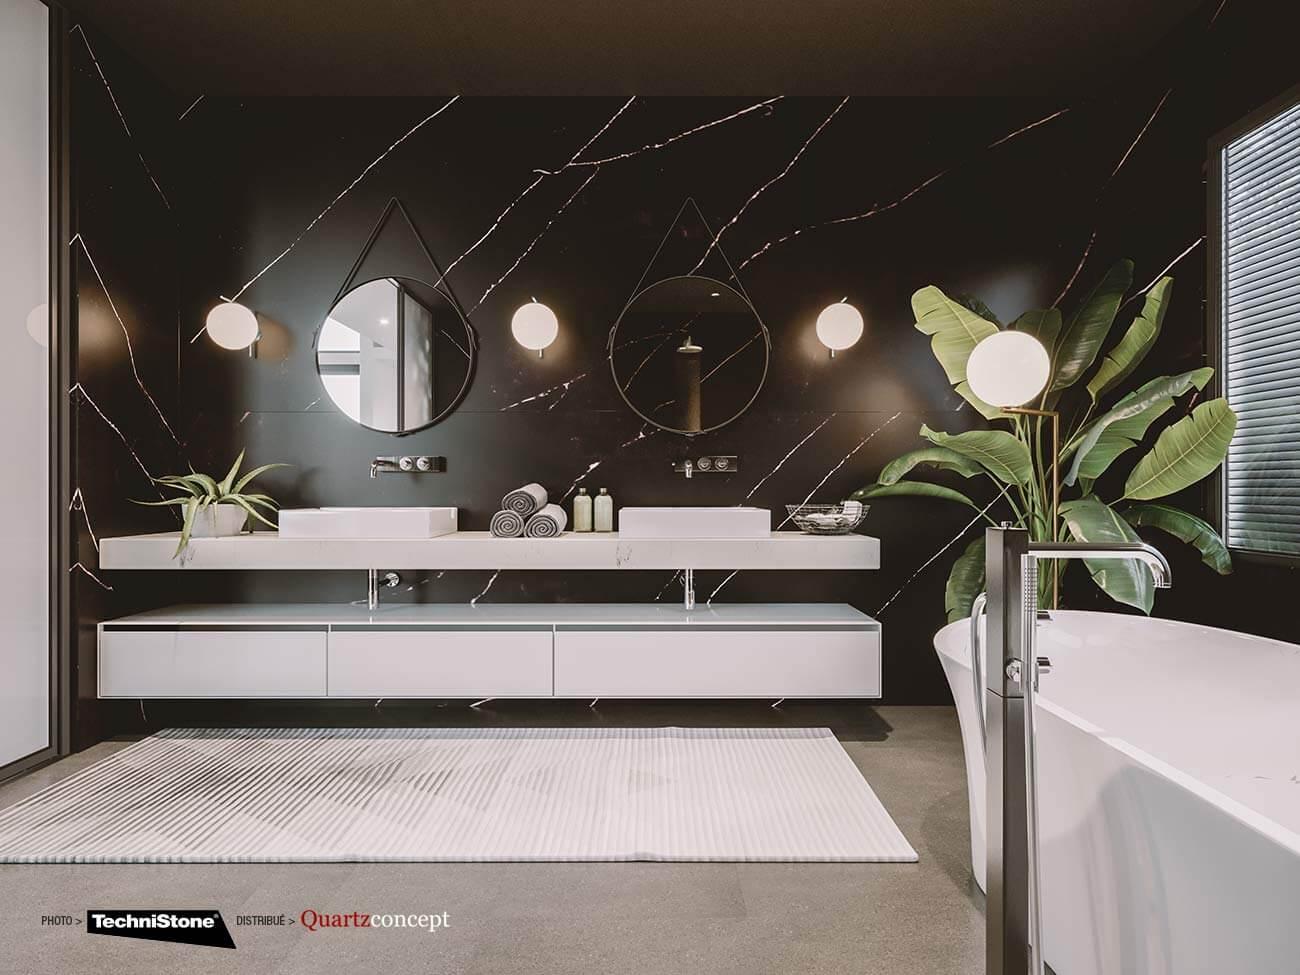 Quartz Technistone | Comptoir de cuisine et salle de bain